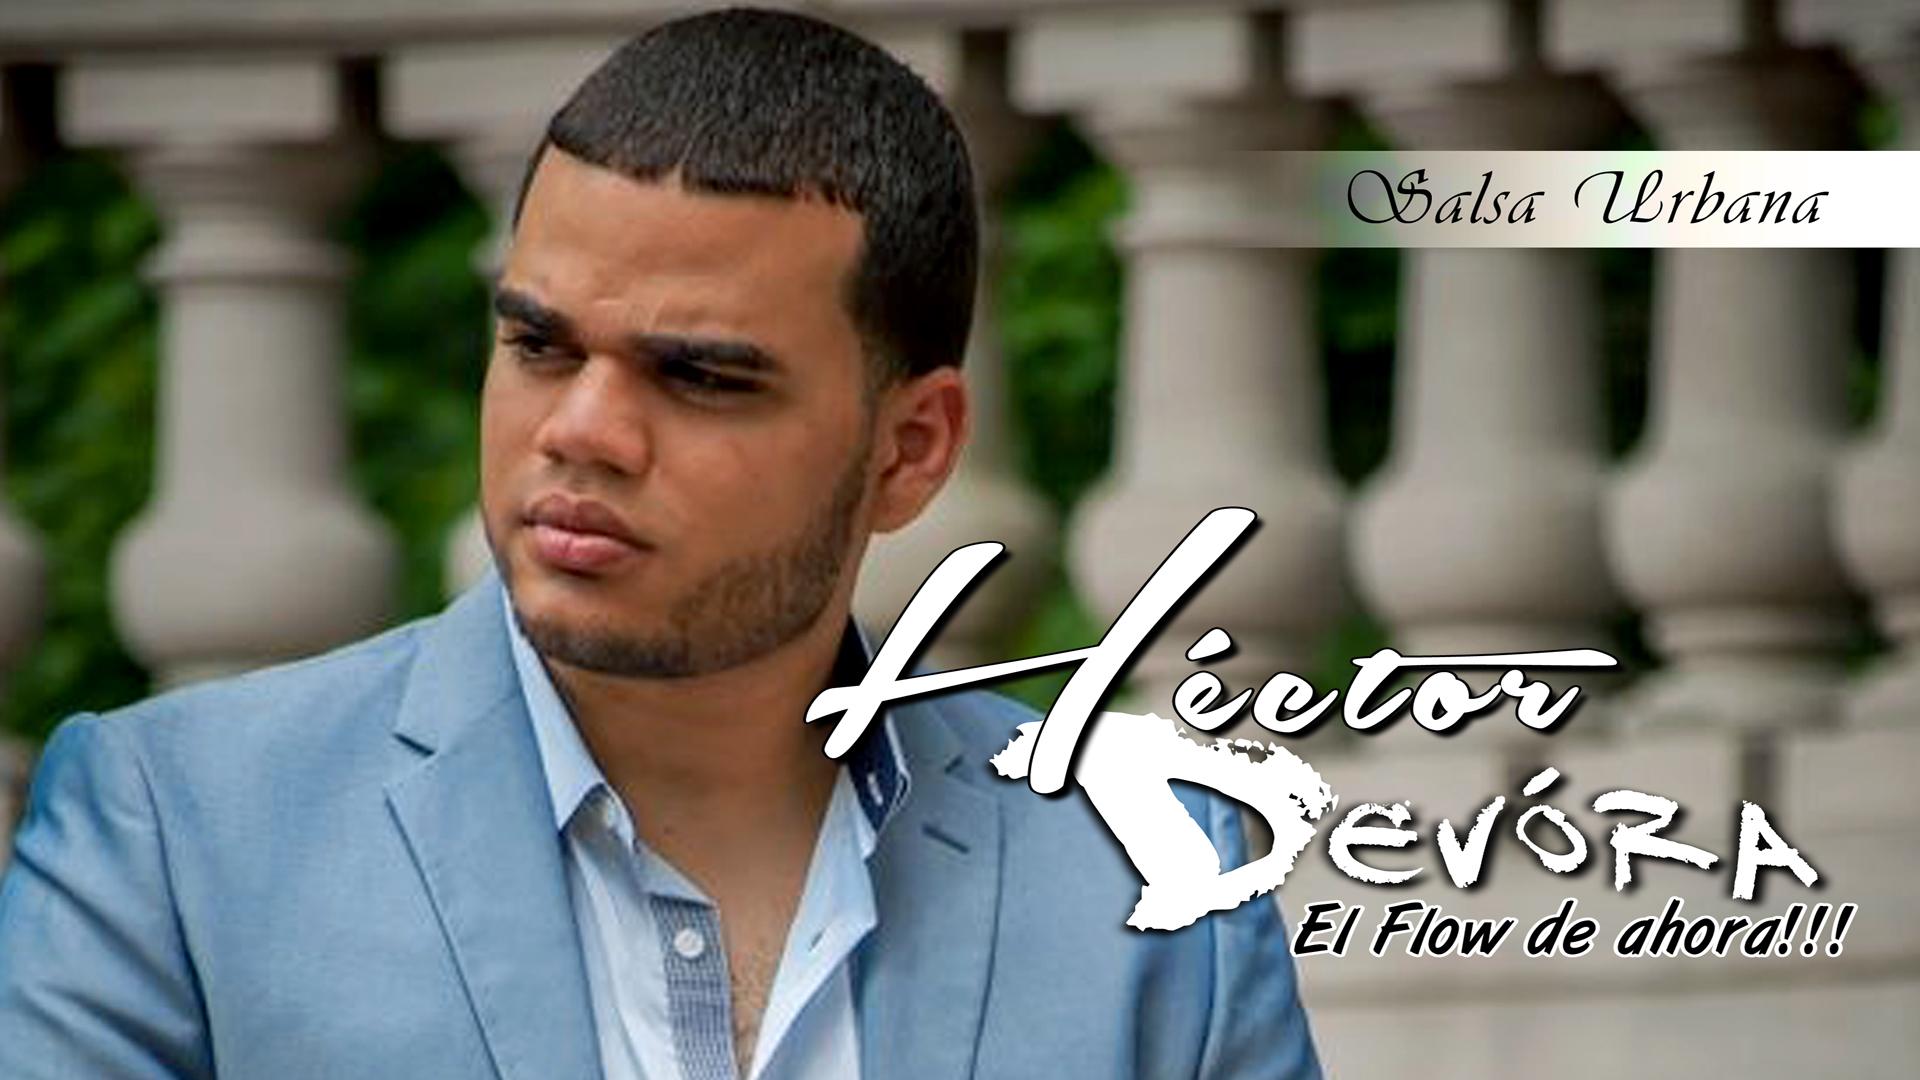 Hector Devora Alta 2